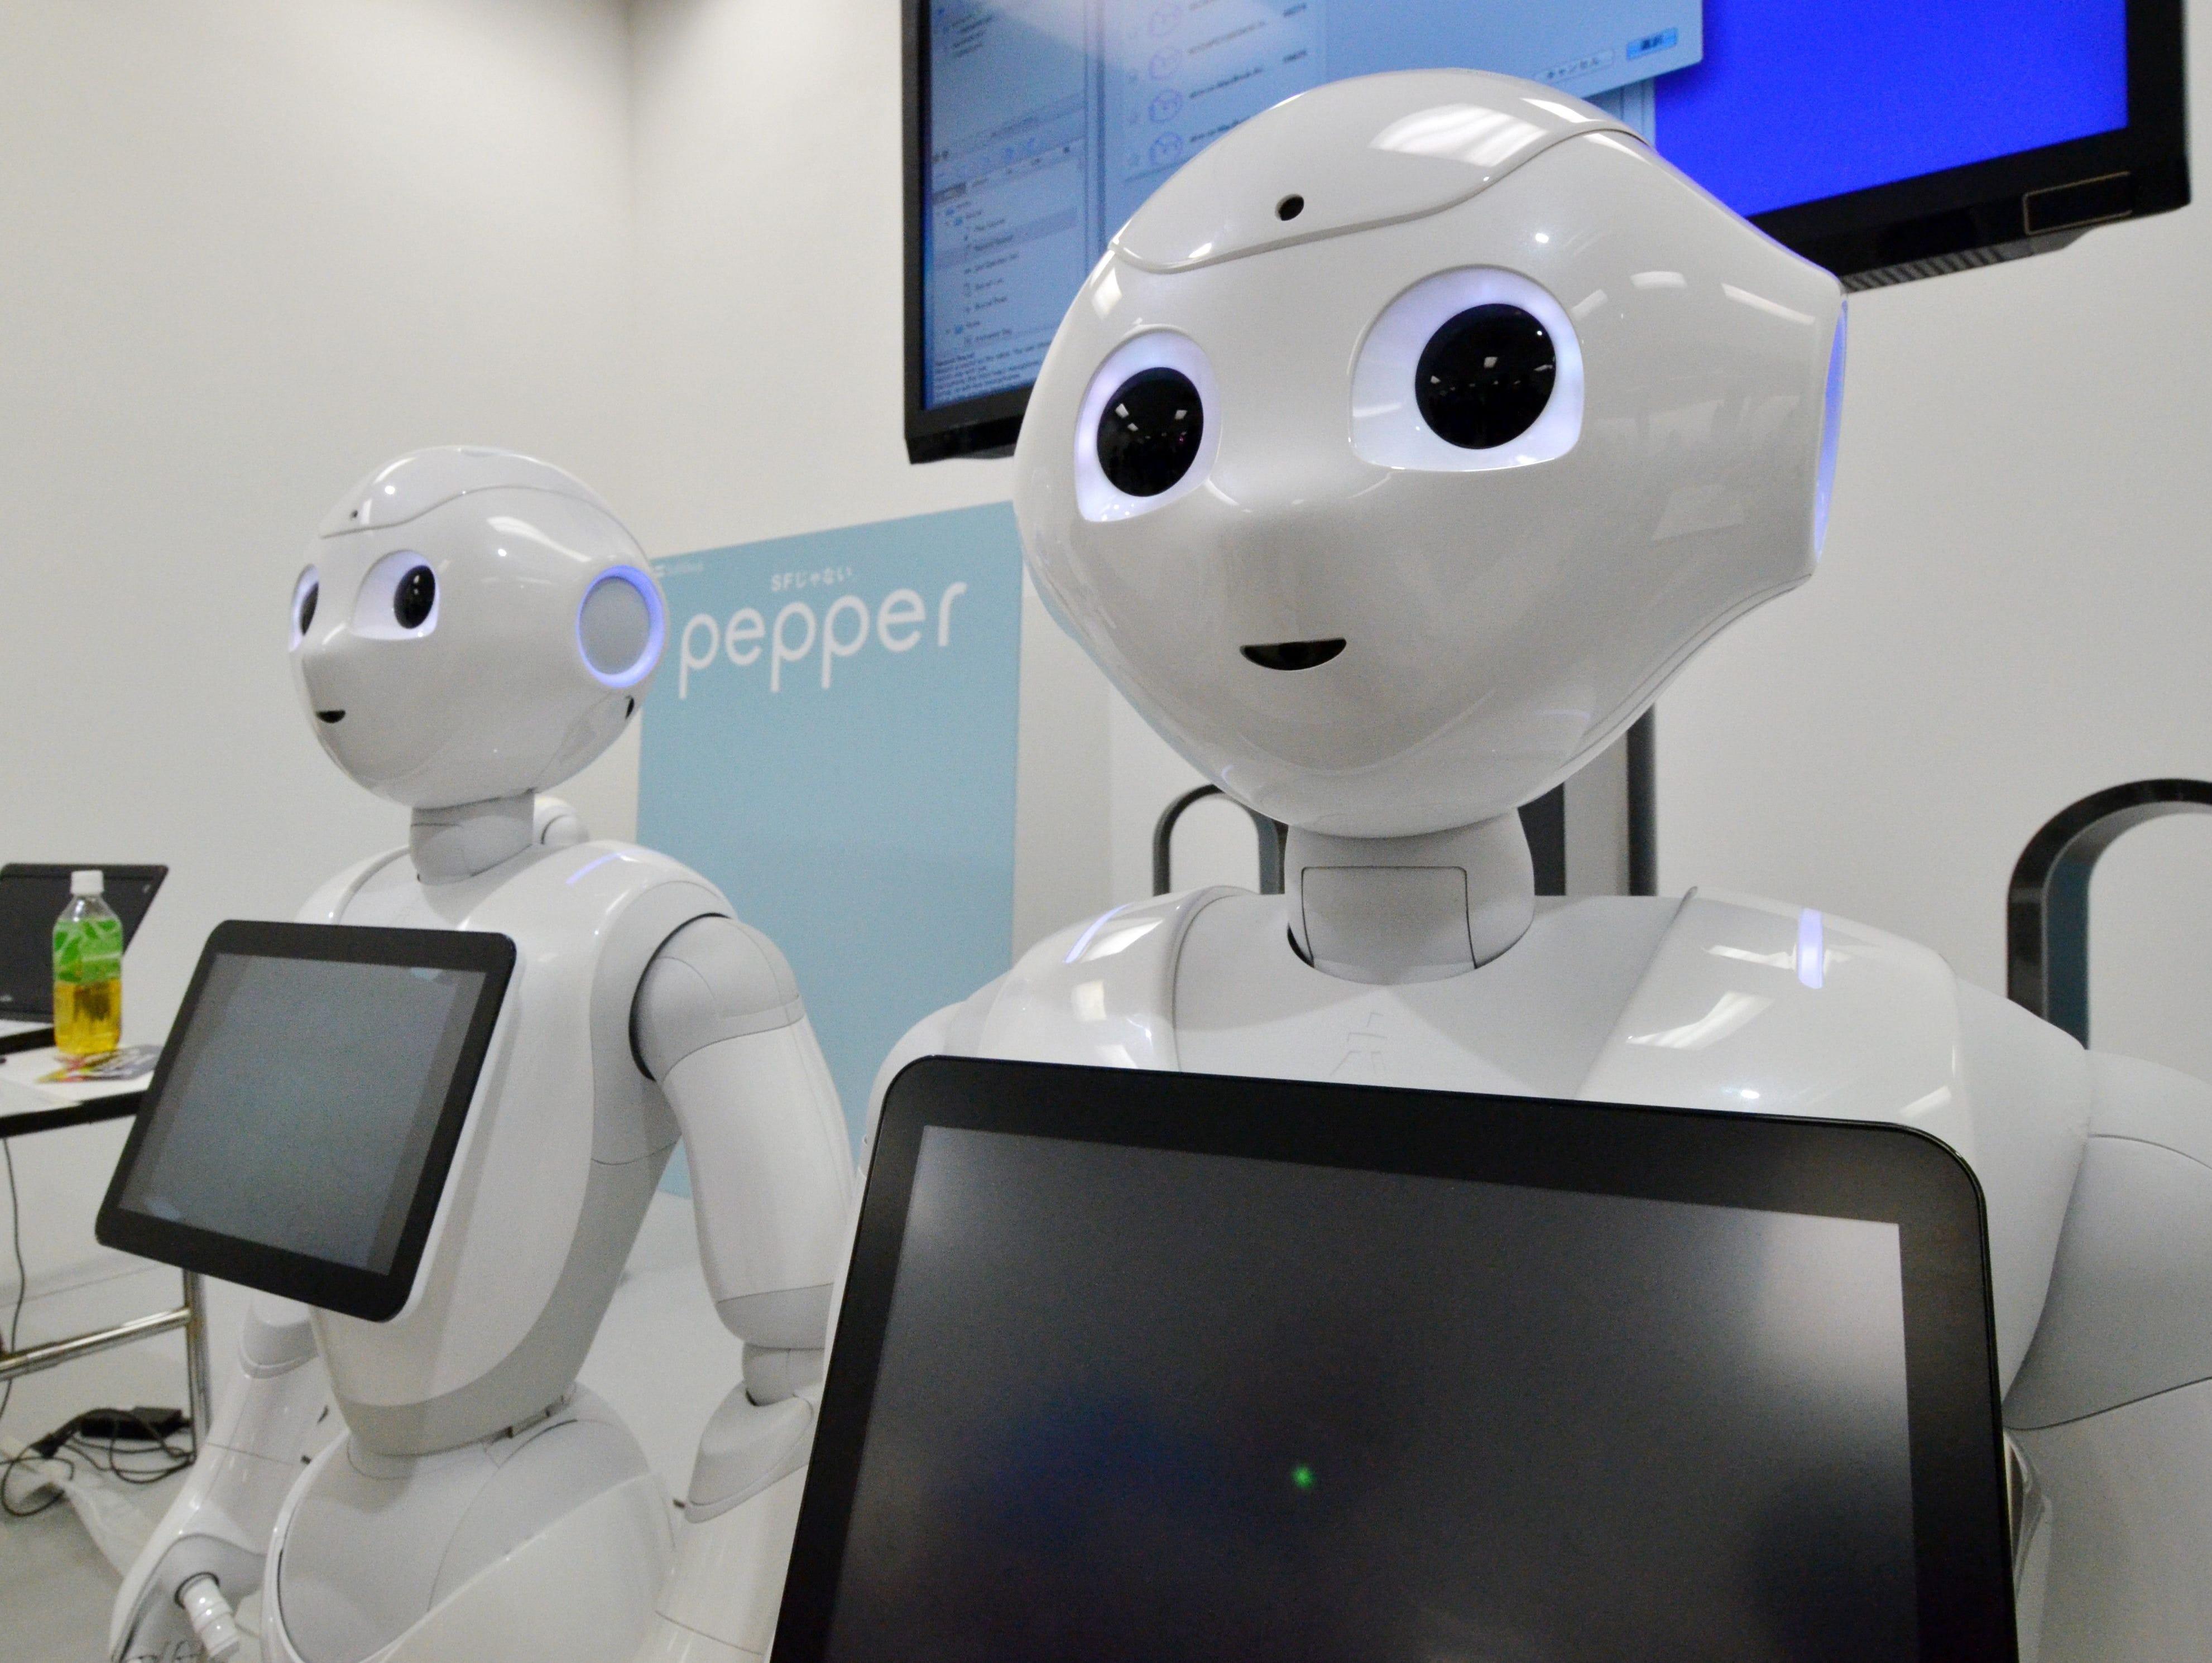 Japanese mobile communication giant Softbank's humanoid robot